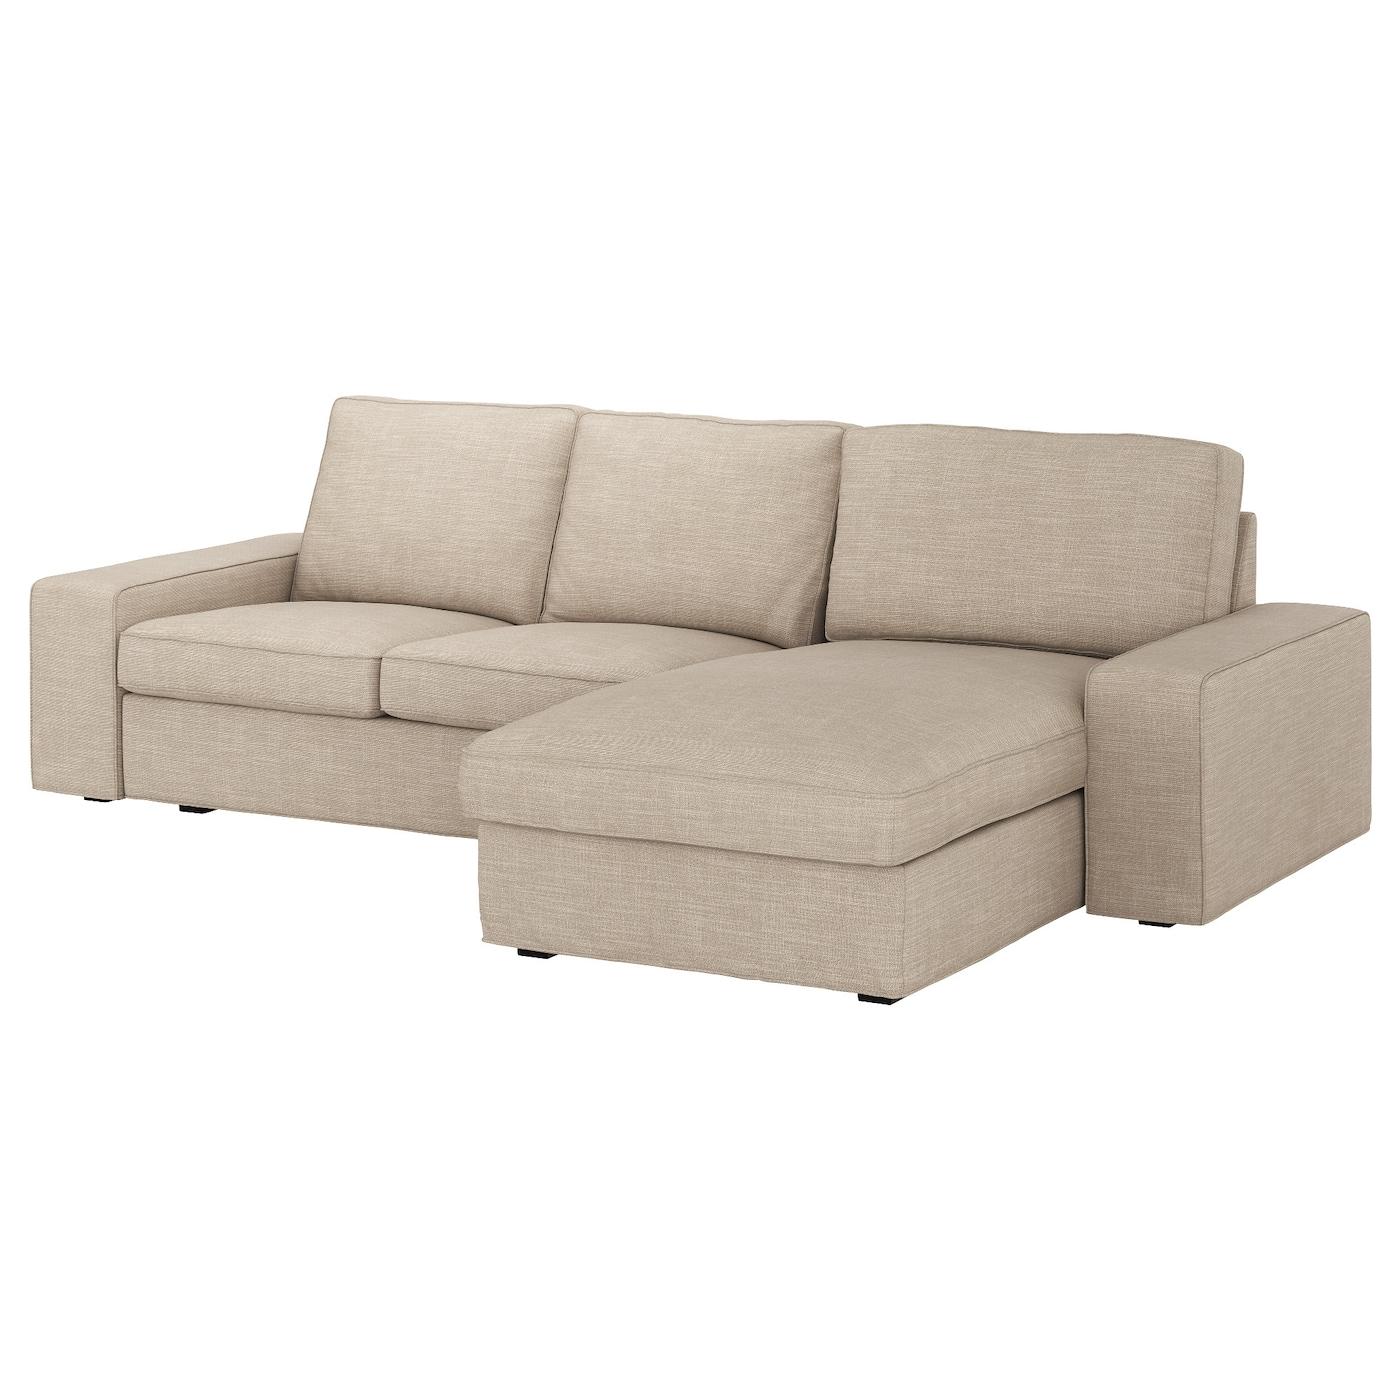 Sofa Chaise Longue Ikea.Kivik 3 Seat Sofa Hillared With Chaise Longue Hillared Anthracite